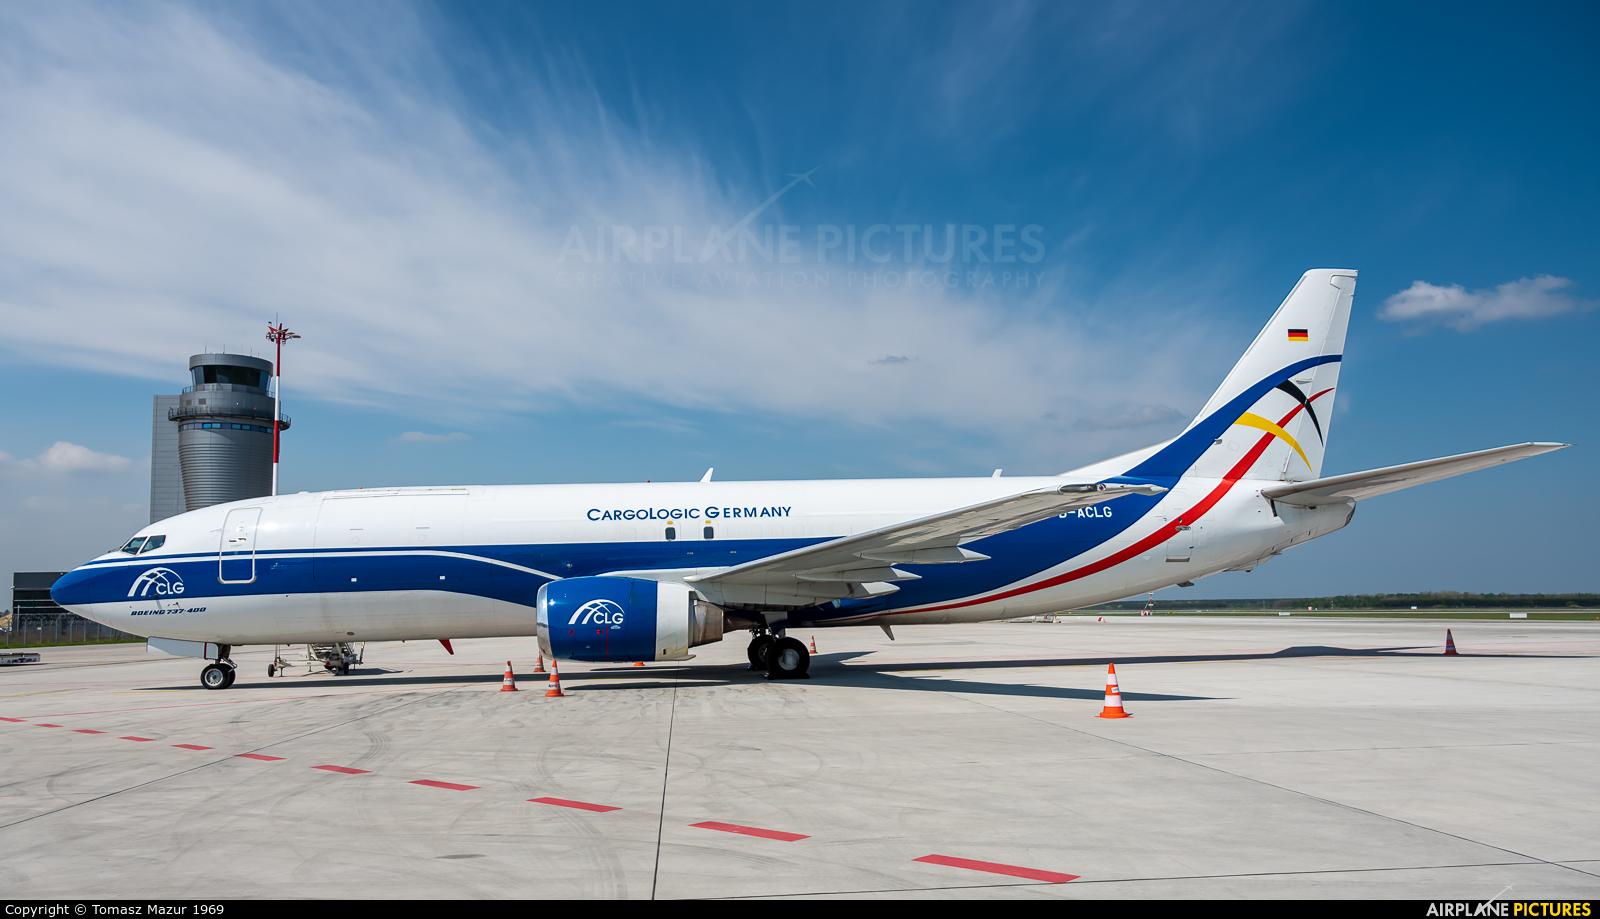 CargoLogic Germany D-ACLG aircraft at Katowice - Pyrzowice